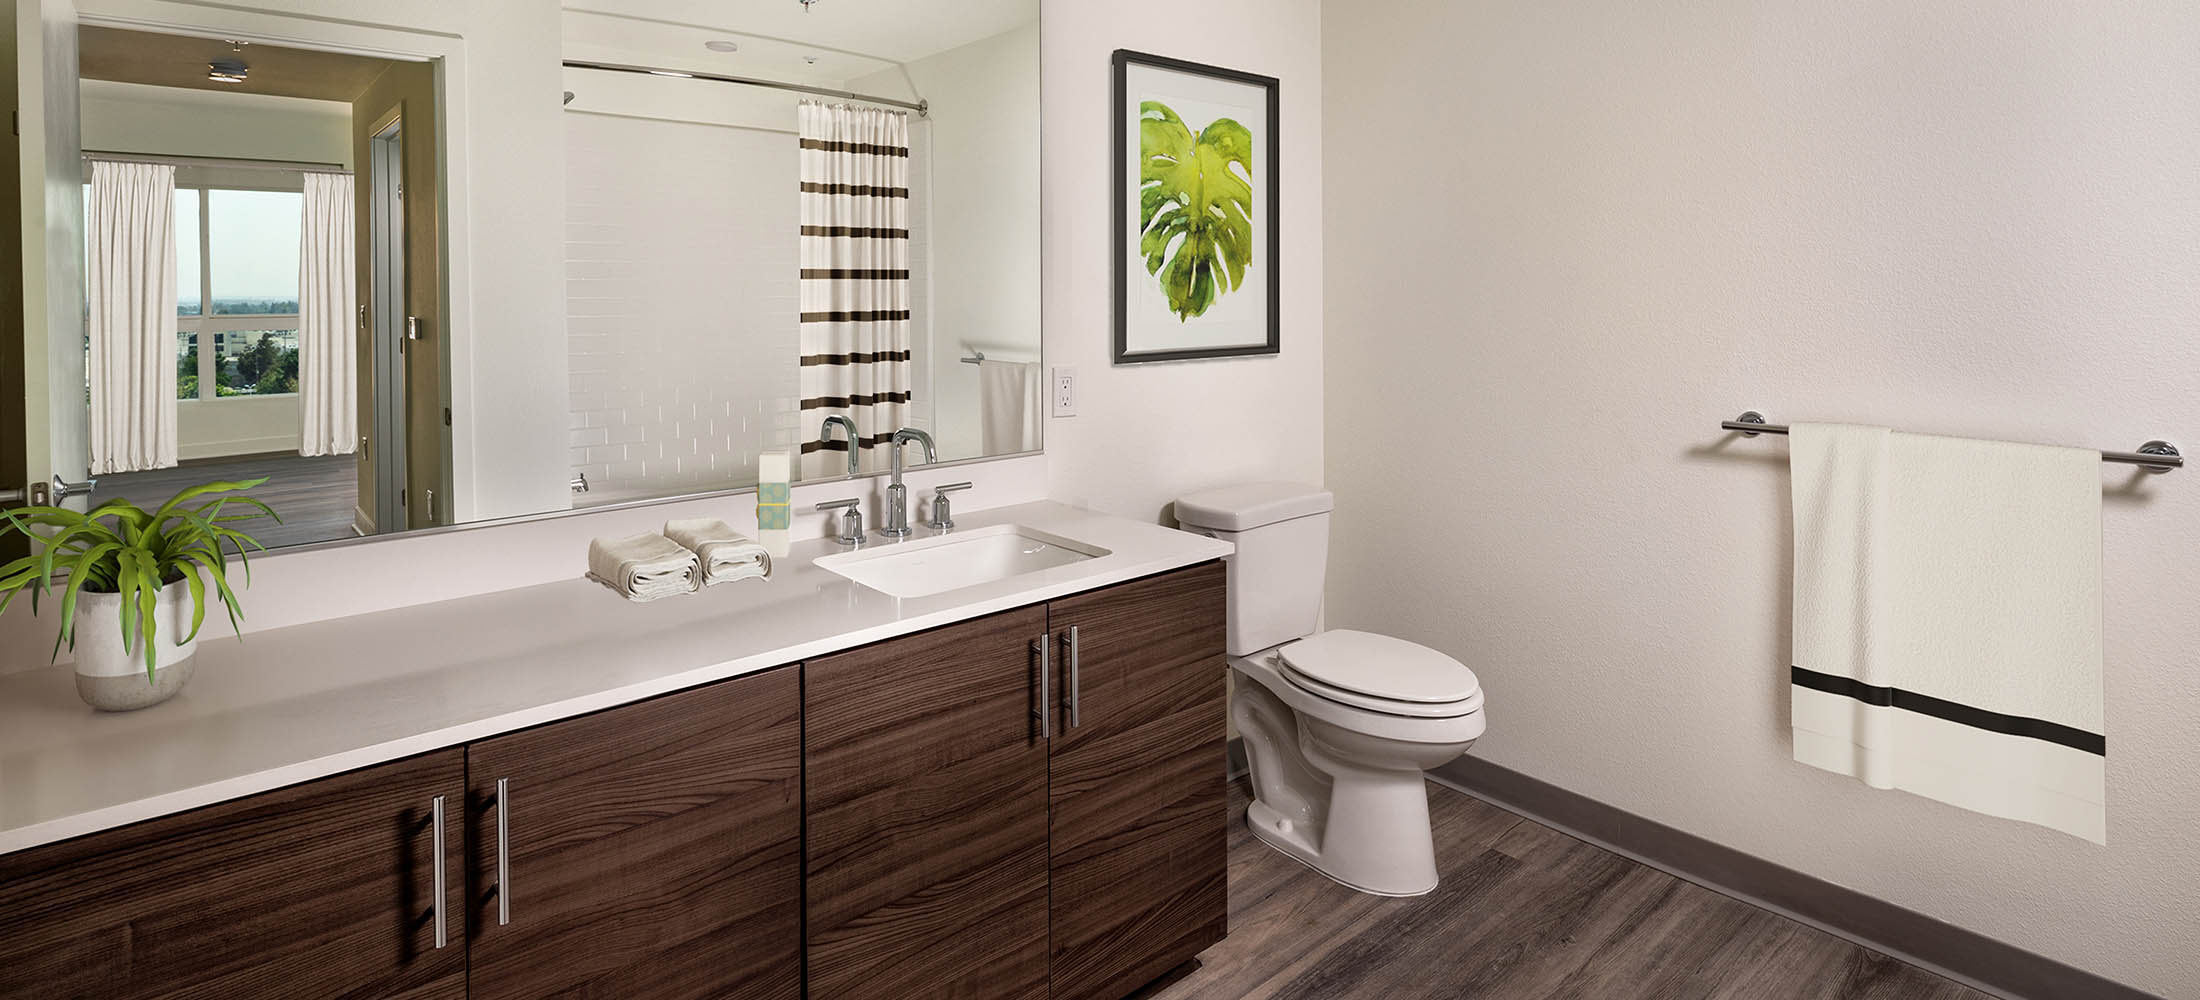 Two Bedroom Master Bathroom